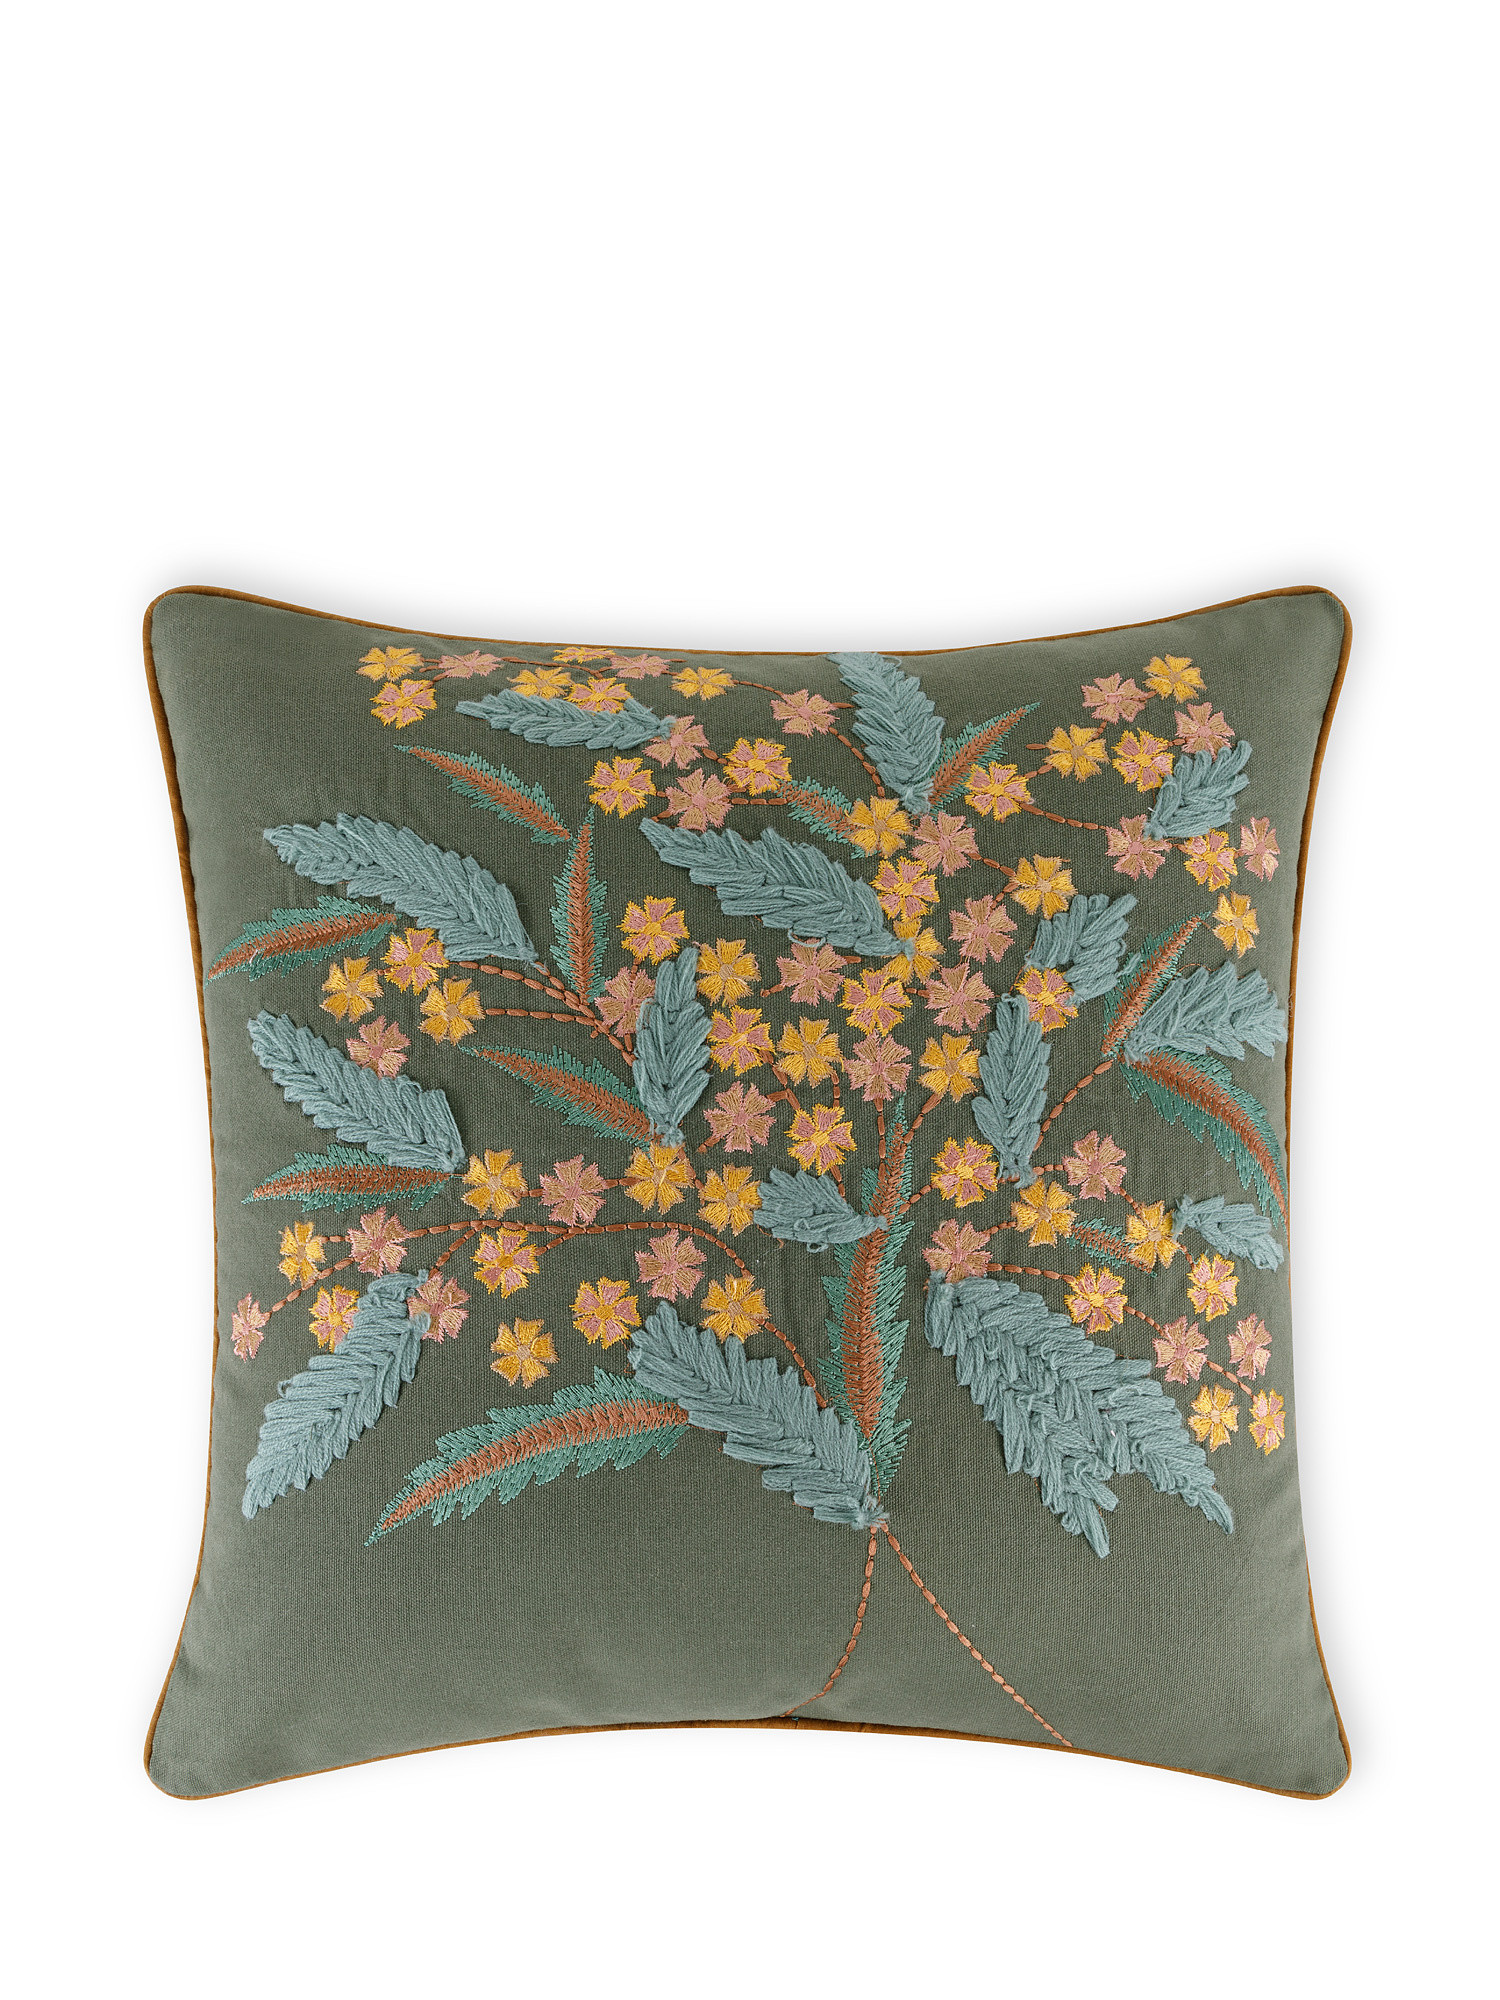 Cuscino cotone ricamo bouquet 45x45cm, Multicolor, large image number 0